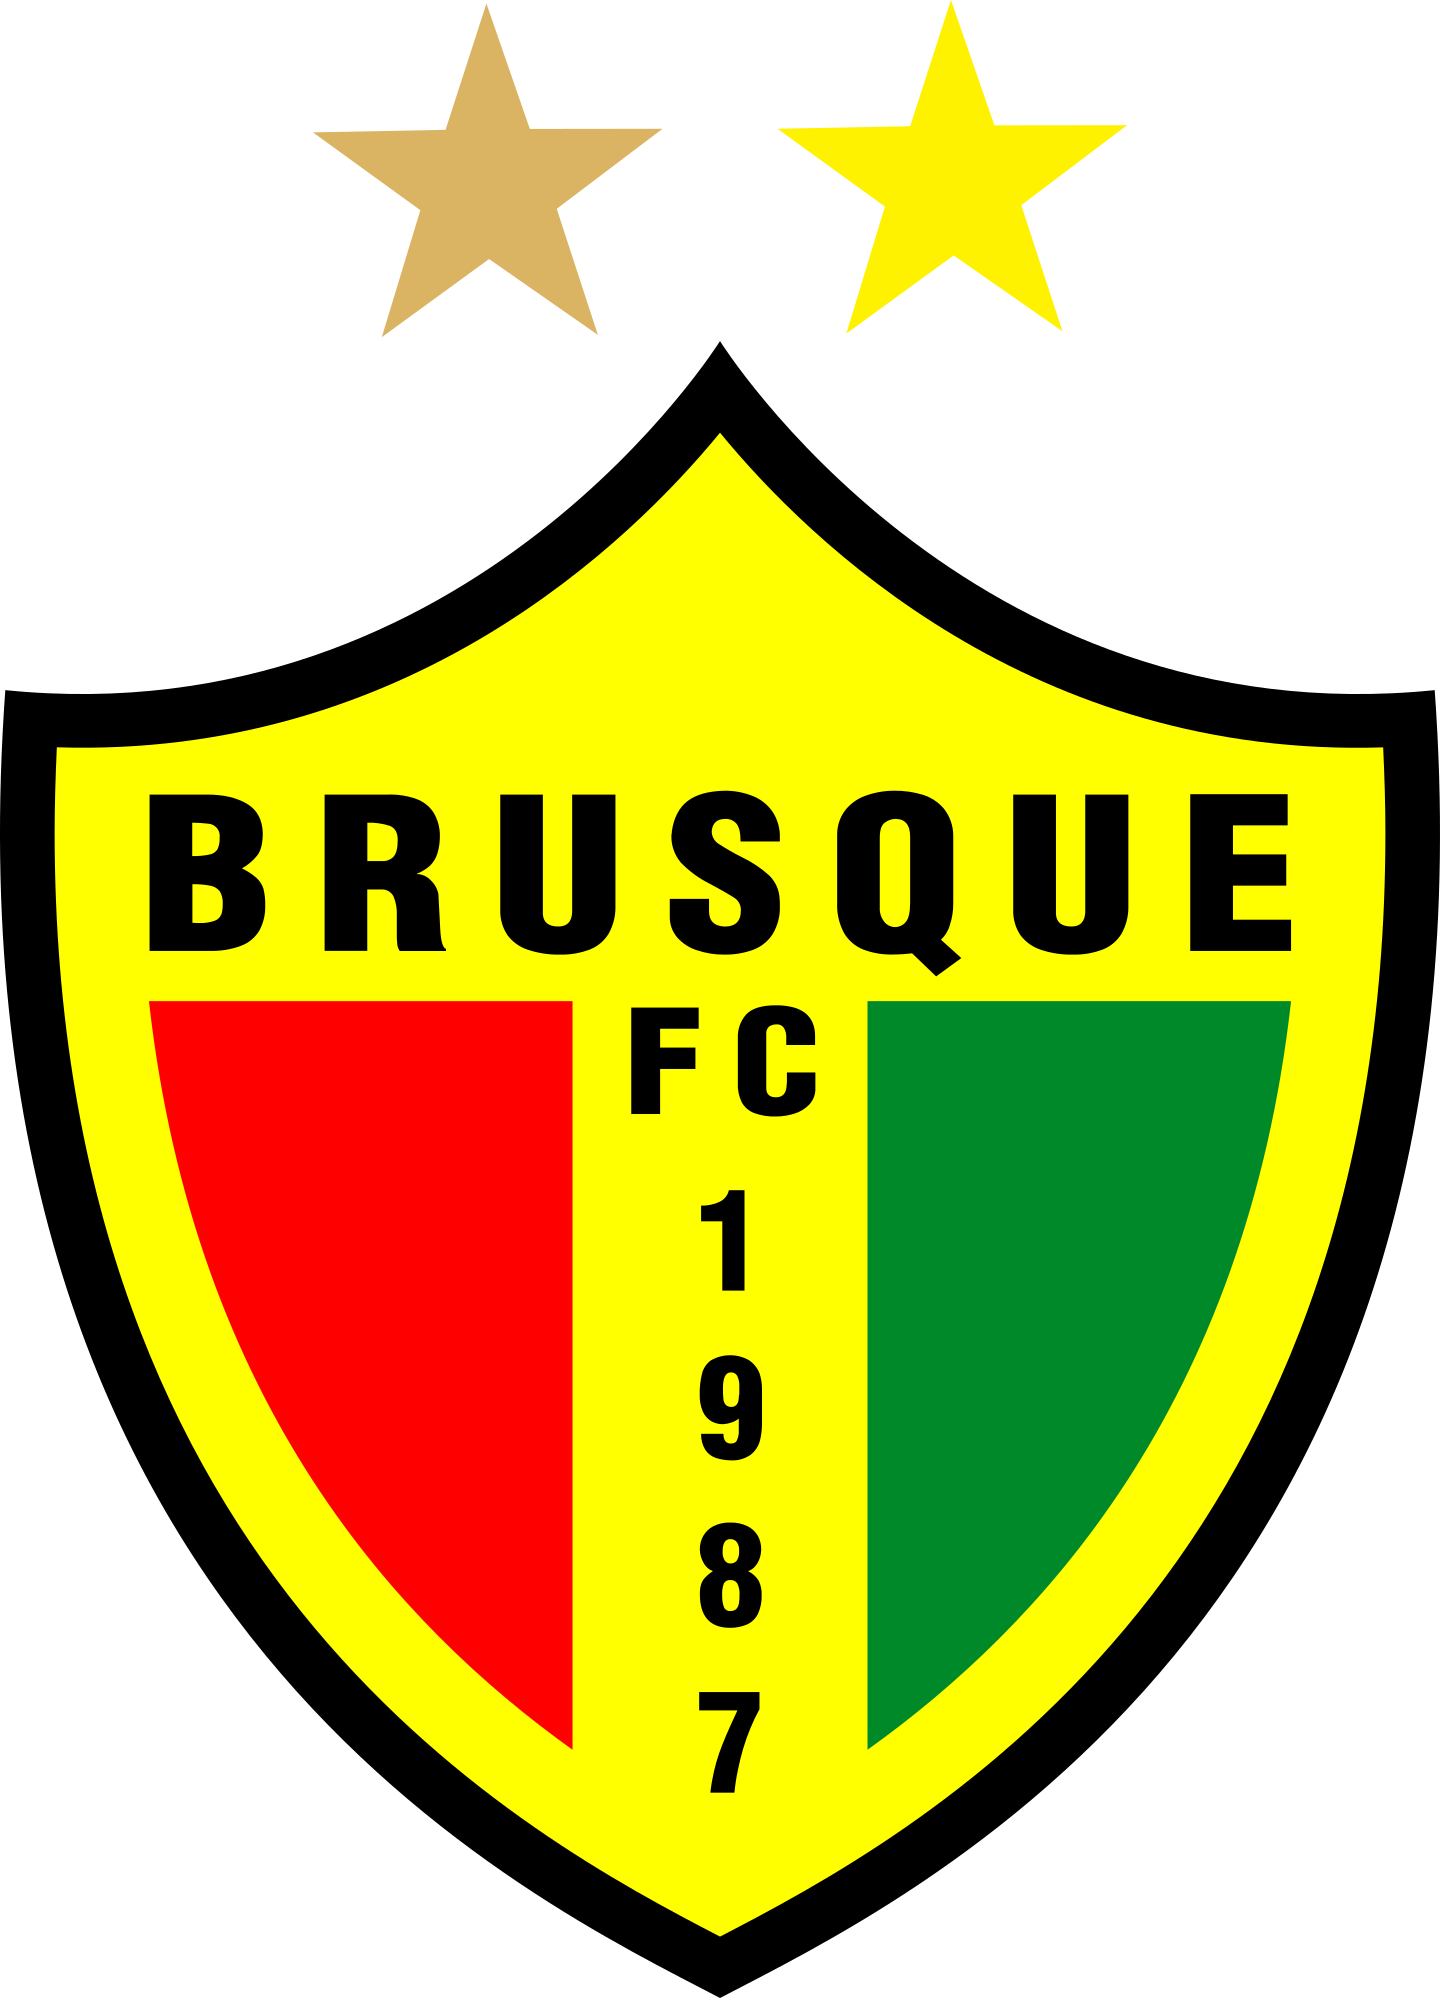 brusque fc logo 2 - Brusque FC Logo (Brazil)